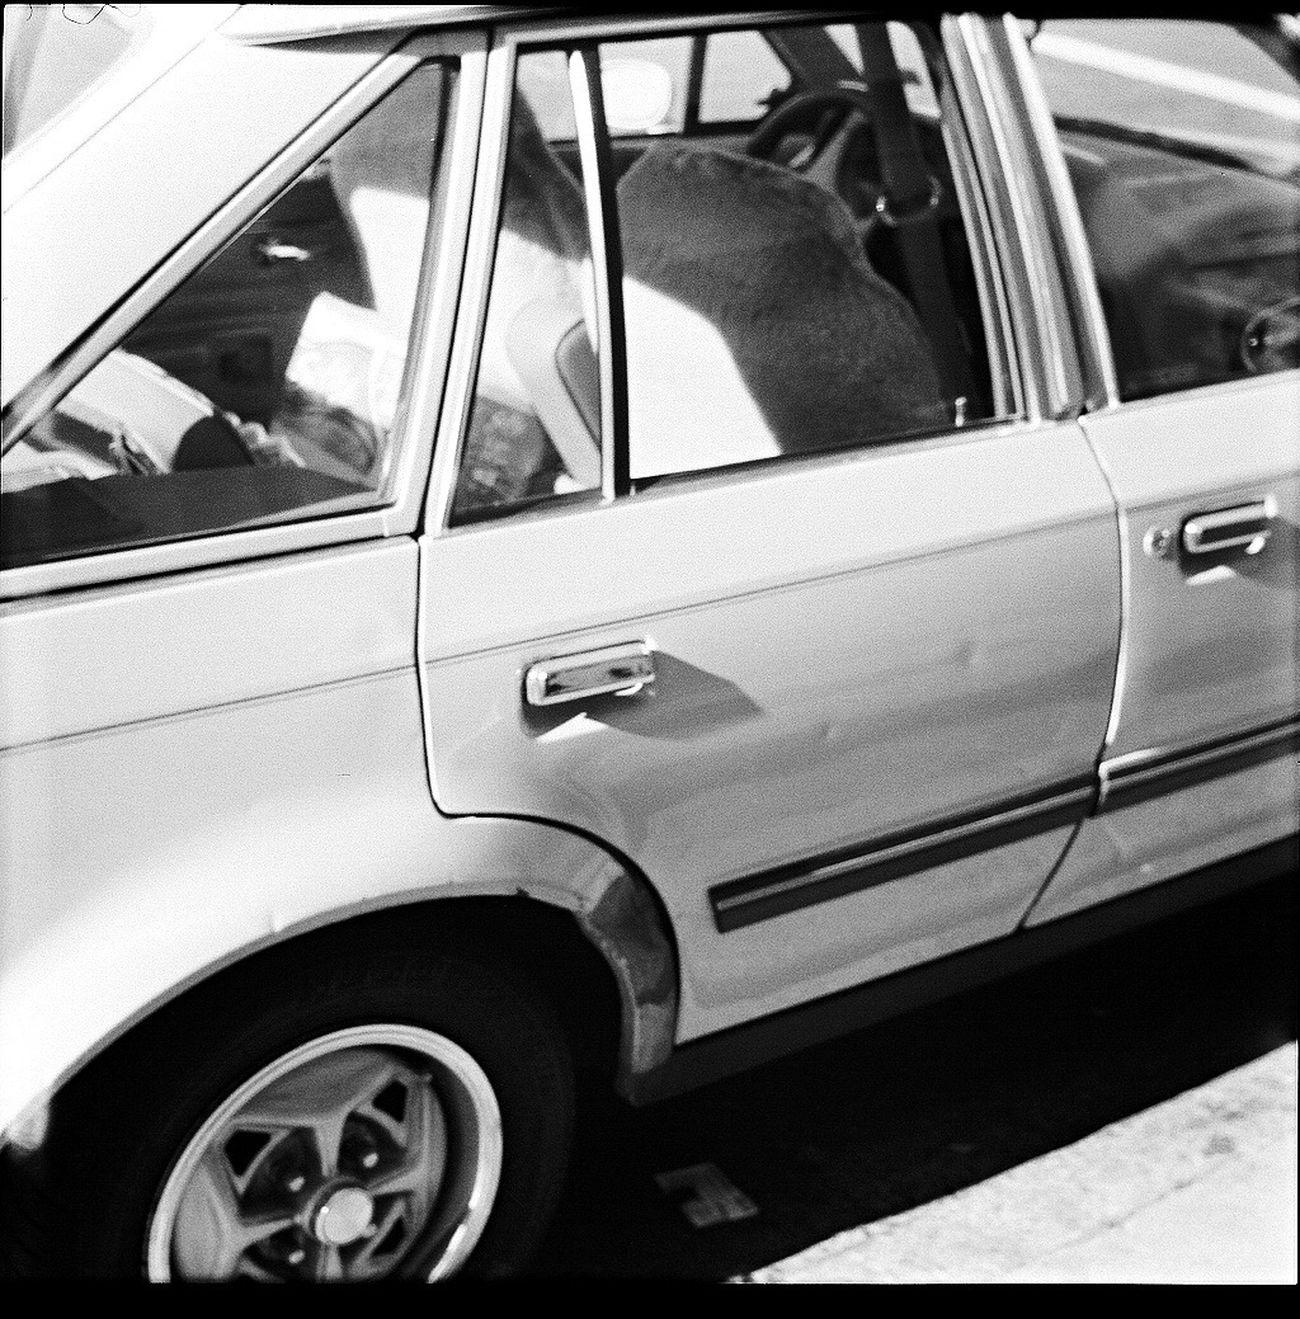 Transportation Land Vehicle Car Film Square 6x6 Blk N Wht Koduckgirl Belair Panorama